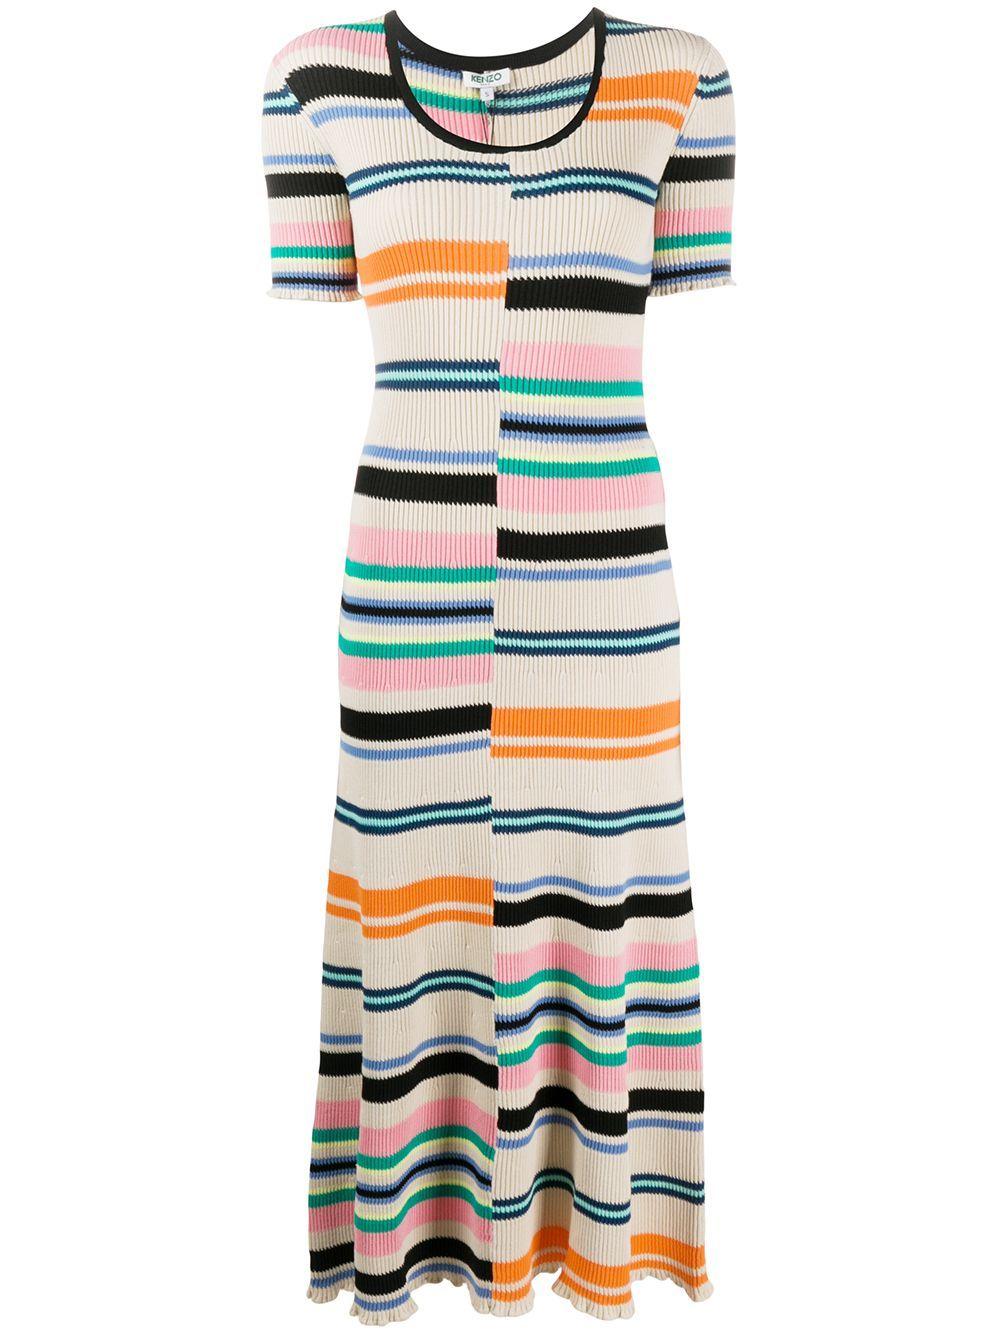 Kenzo Striped Knitted Dress Farfetch Knit Dress Striped Knit Dress Trending Dresses [ 1334 x 1000 Pixel ]